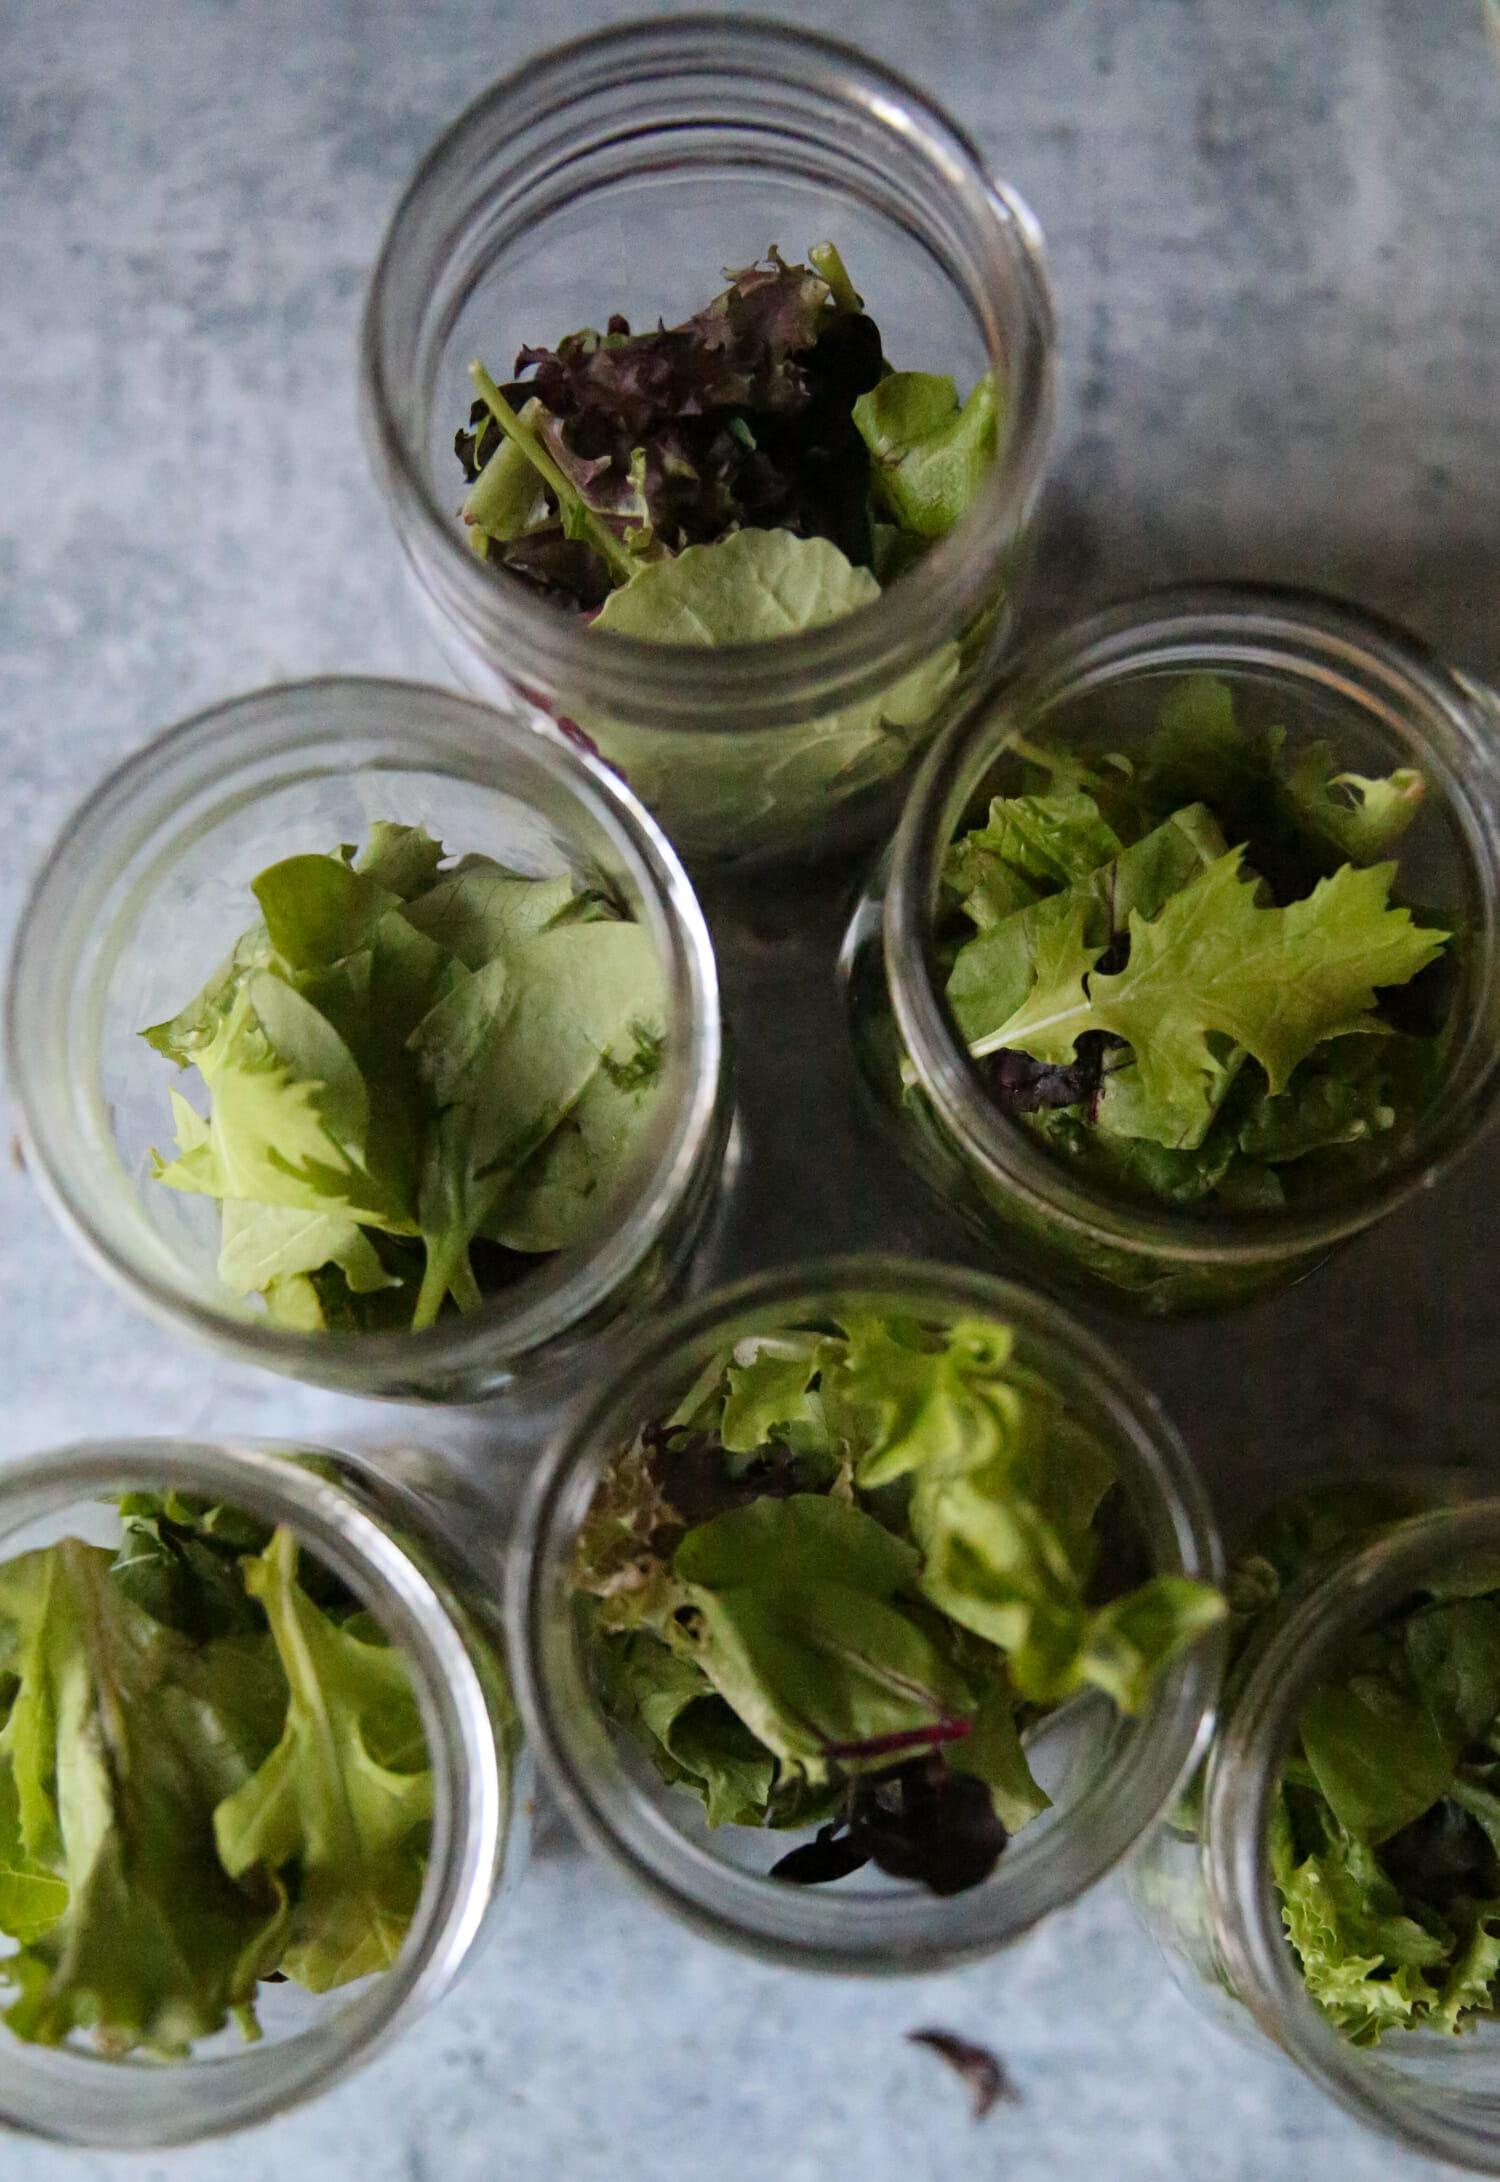 salad greens in jars